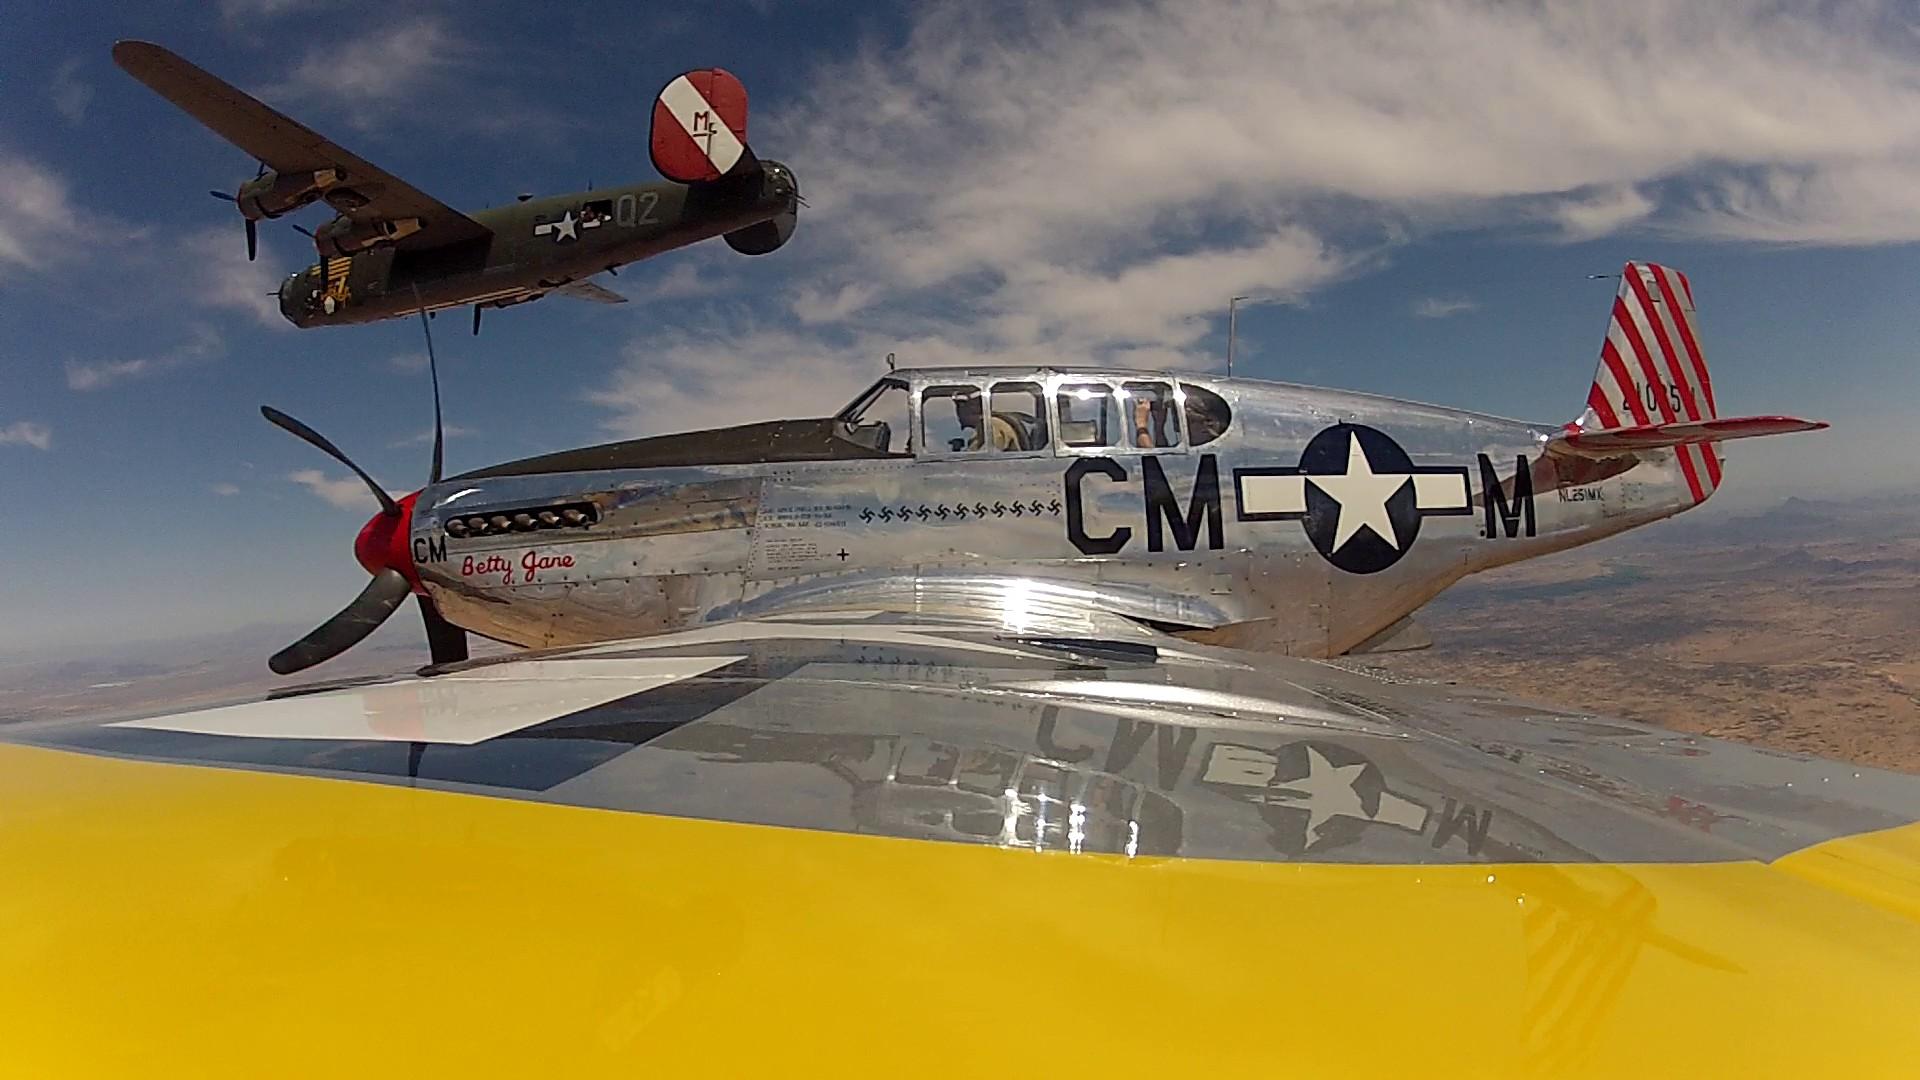 Collings Foundation P-51 Betty Jane